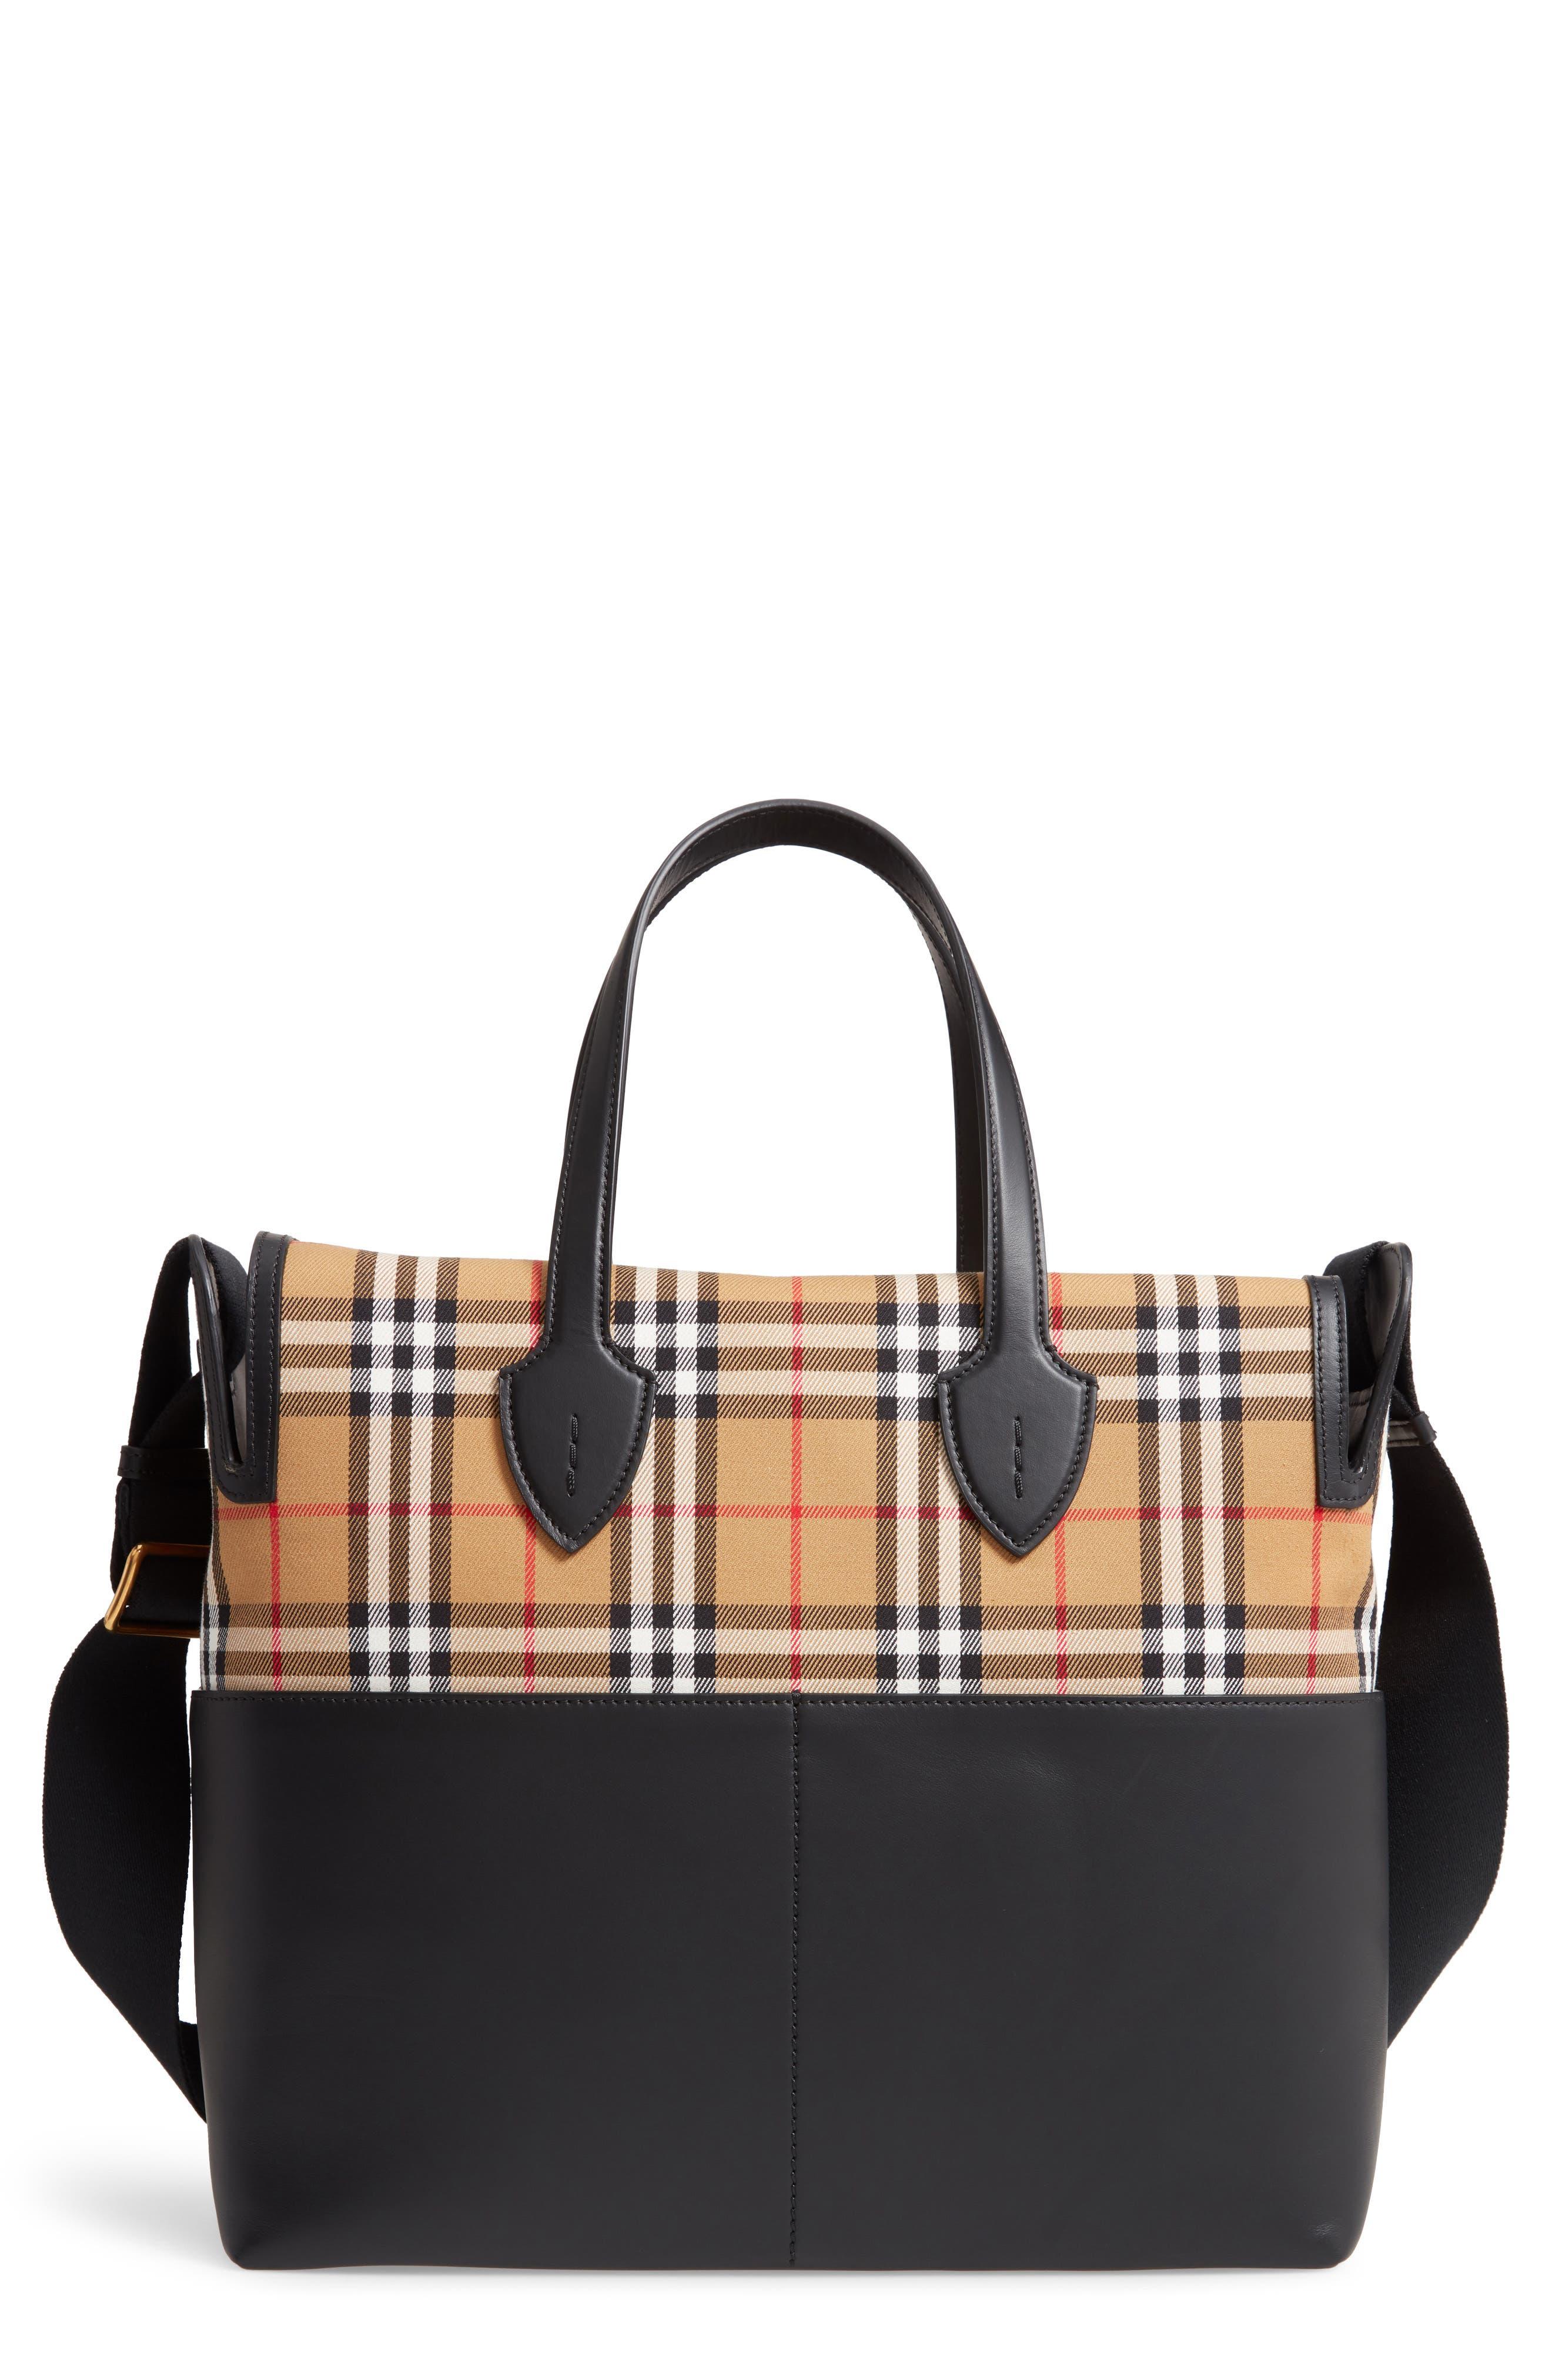 3ed36bbfb3fd Burberry Diaper Bags